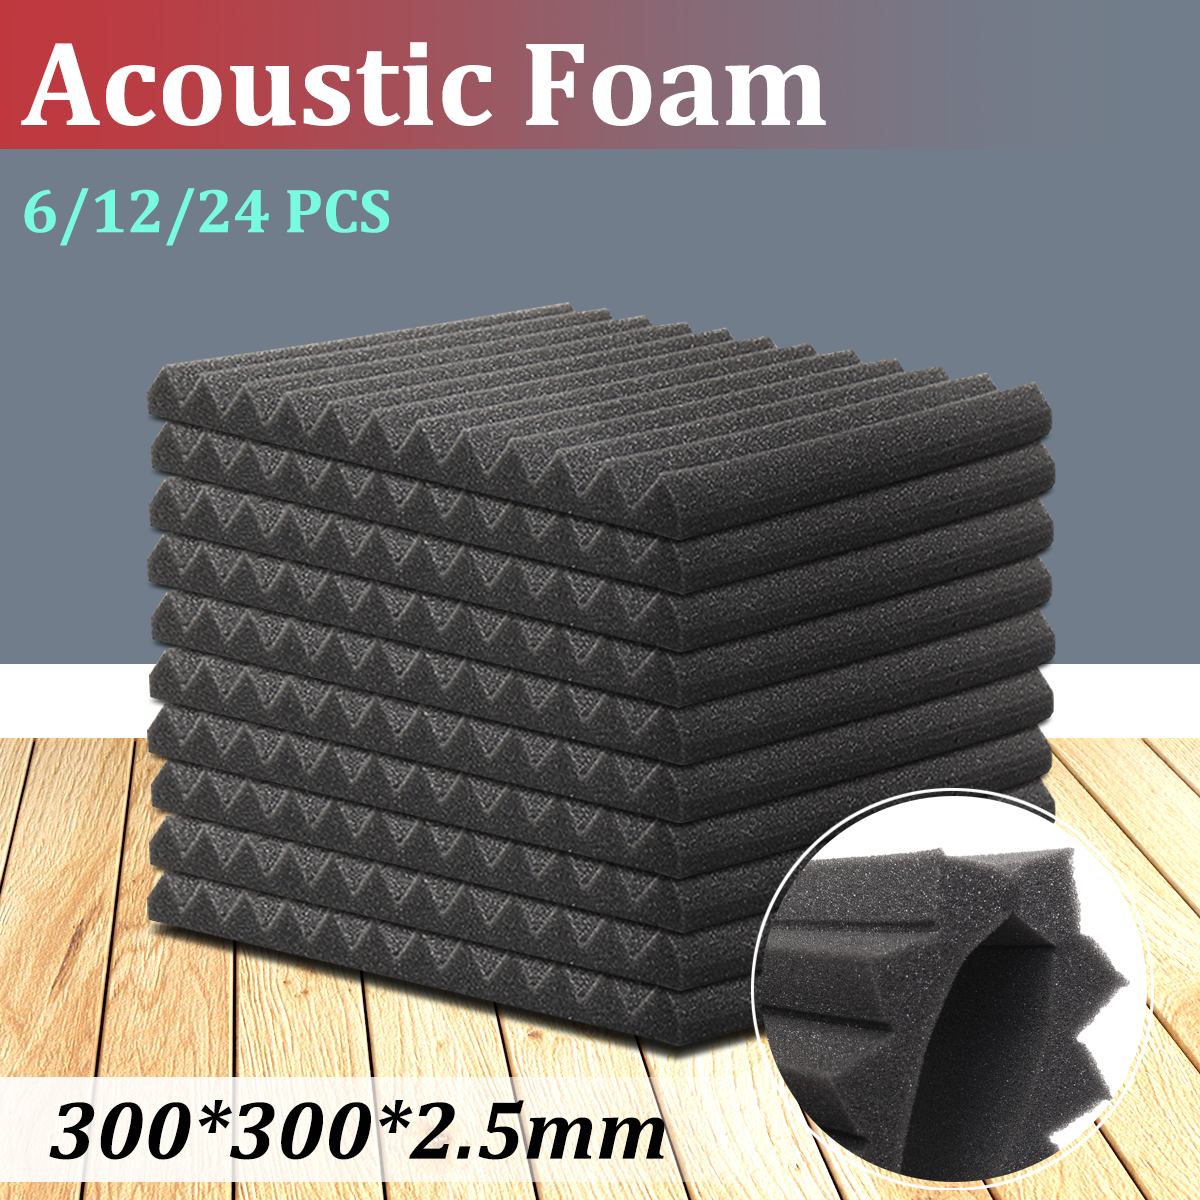 6Pcs/12Pcs Soundproofing Foam Studio Acoustic Foam Panels Sound Treatment Absorption Wedge Tile for KTV Audio Room 300*300*25mm все цены